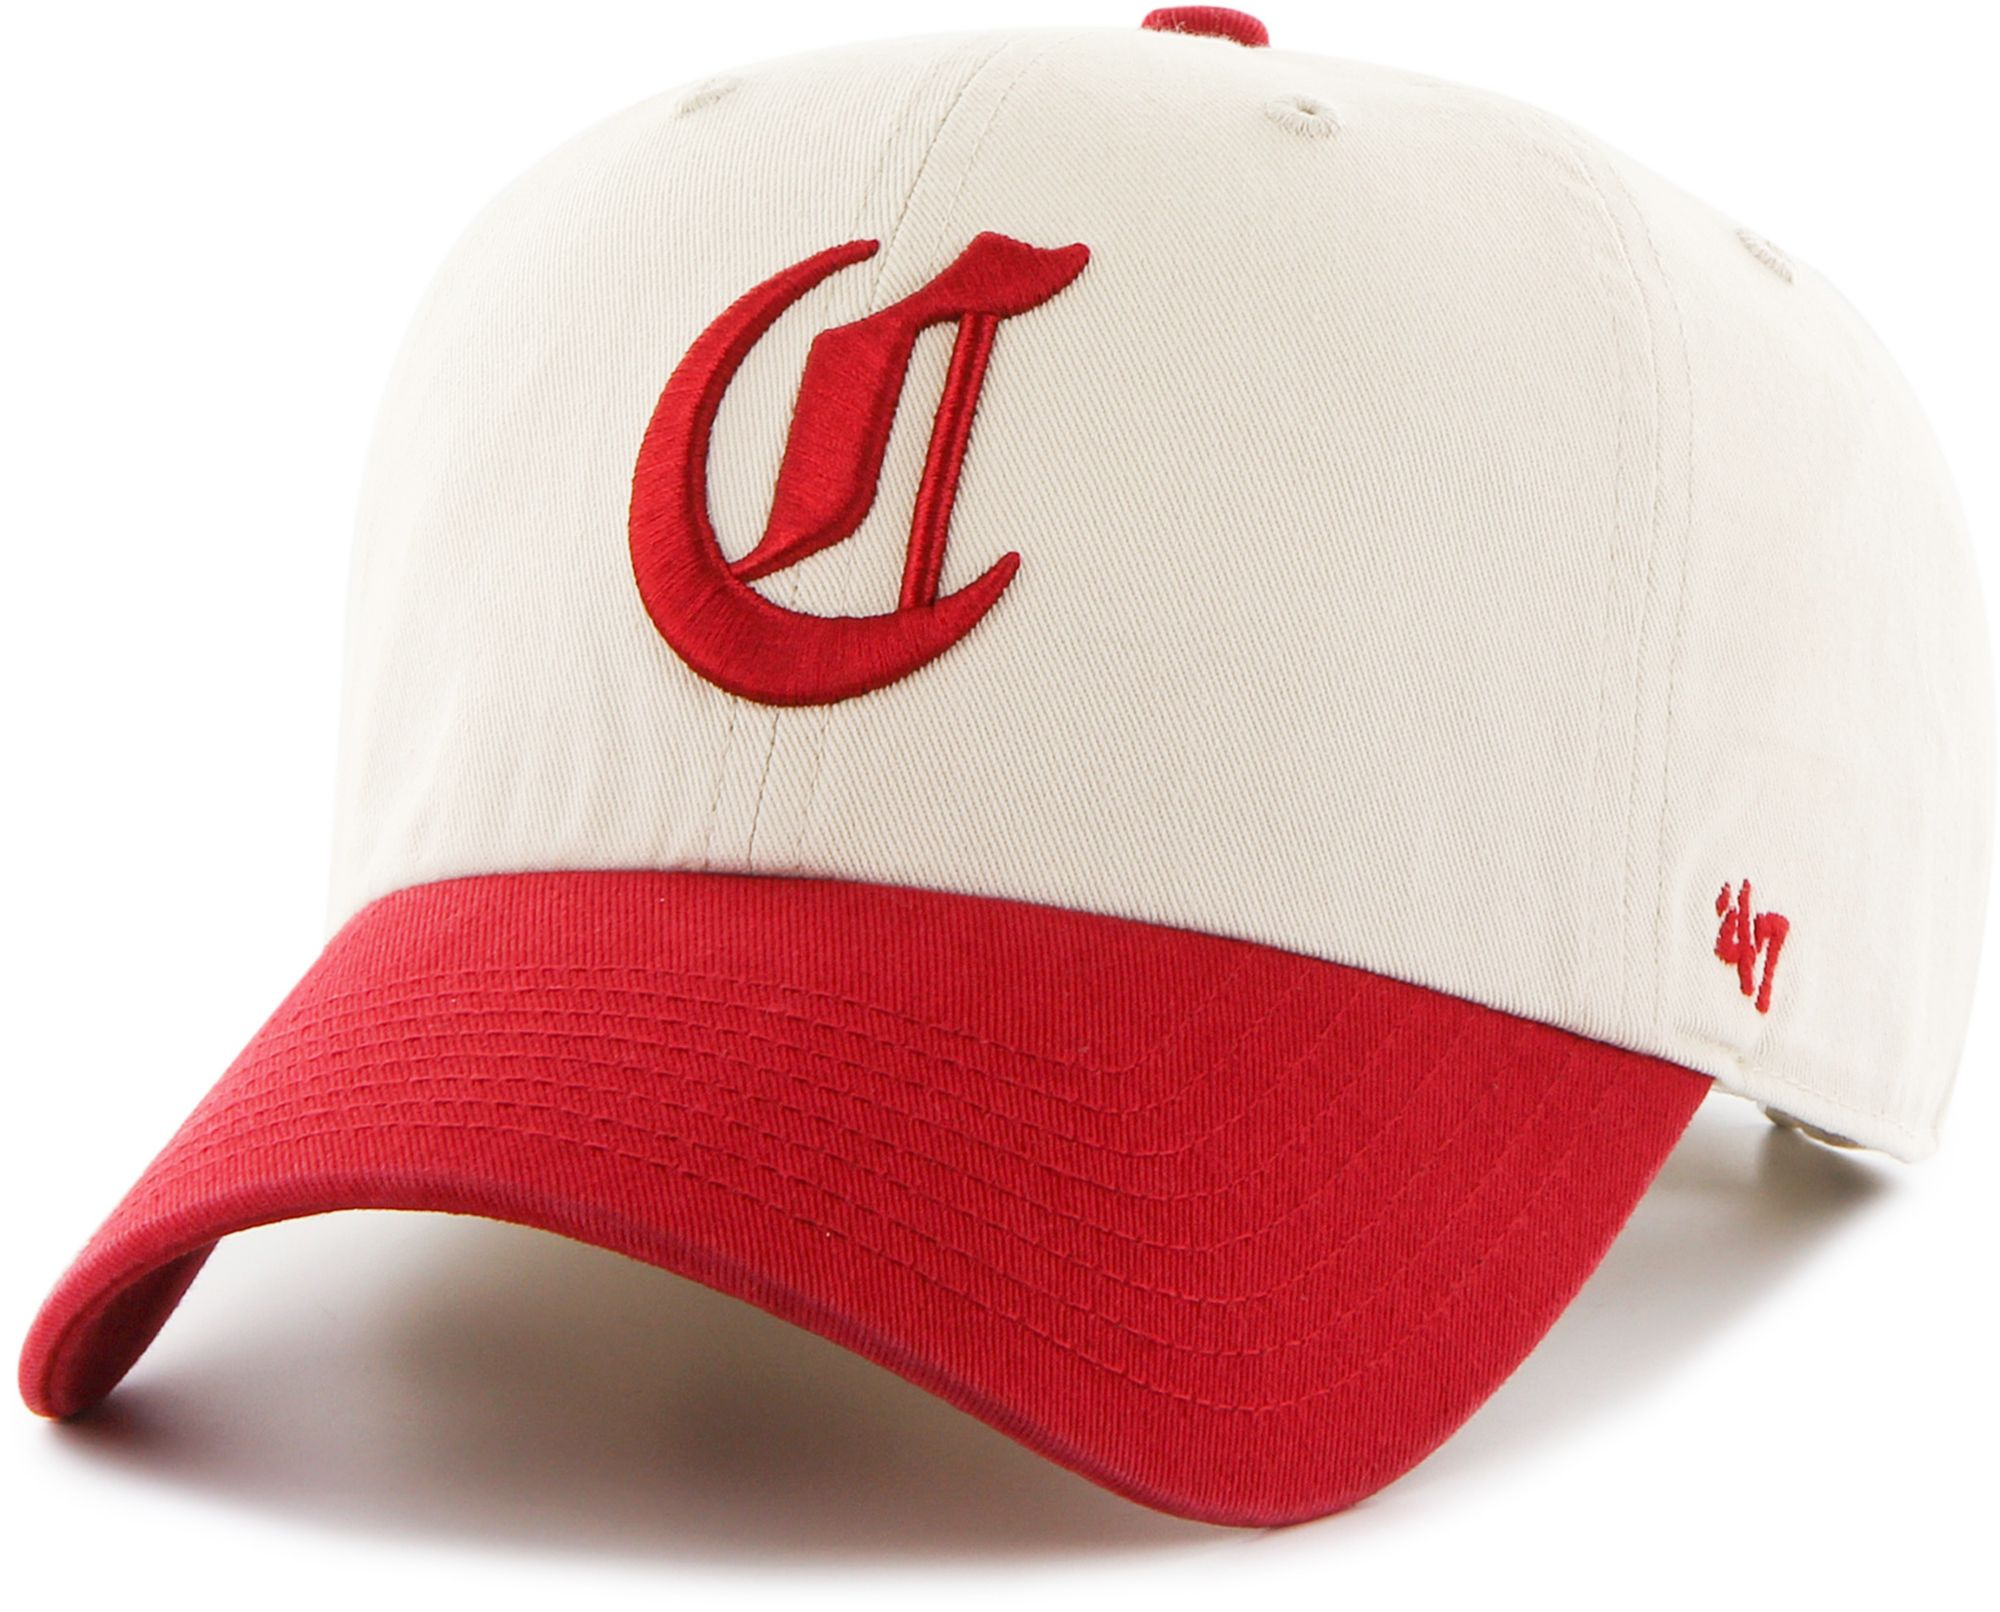 bad37b435ccad ... coupon code for 47 mens cincinnati reds clean up adjustable hat dd9a2  e0293